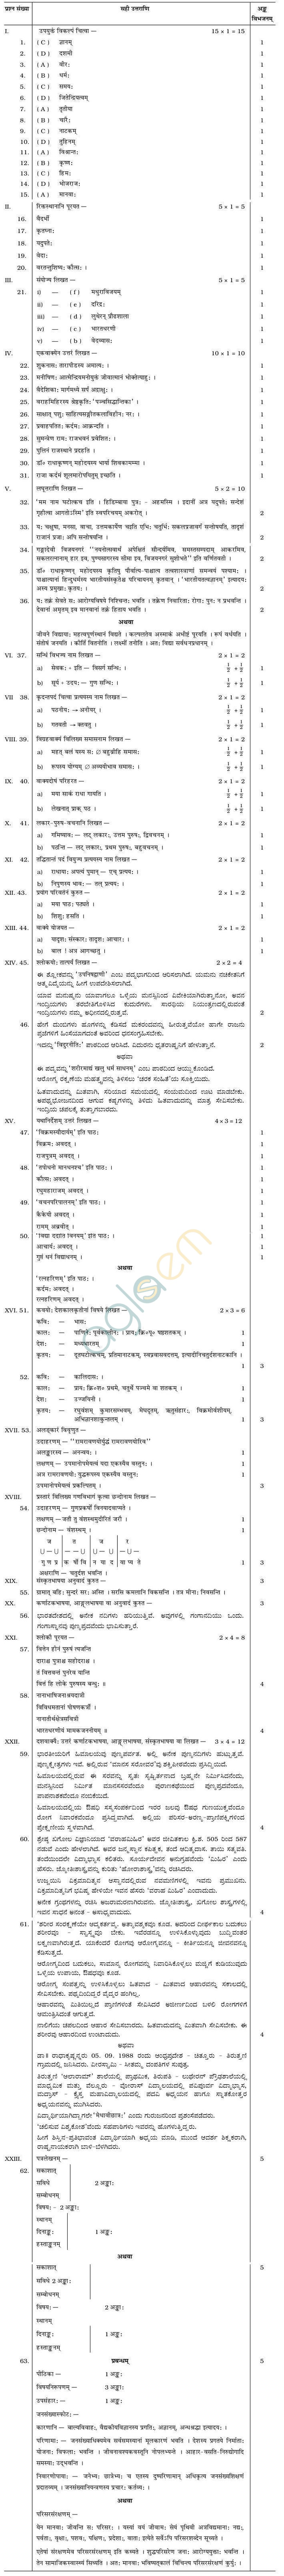 Karnataka SSLC Solved Question Paper June 2014 - Sanskrit